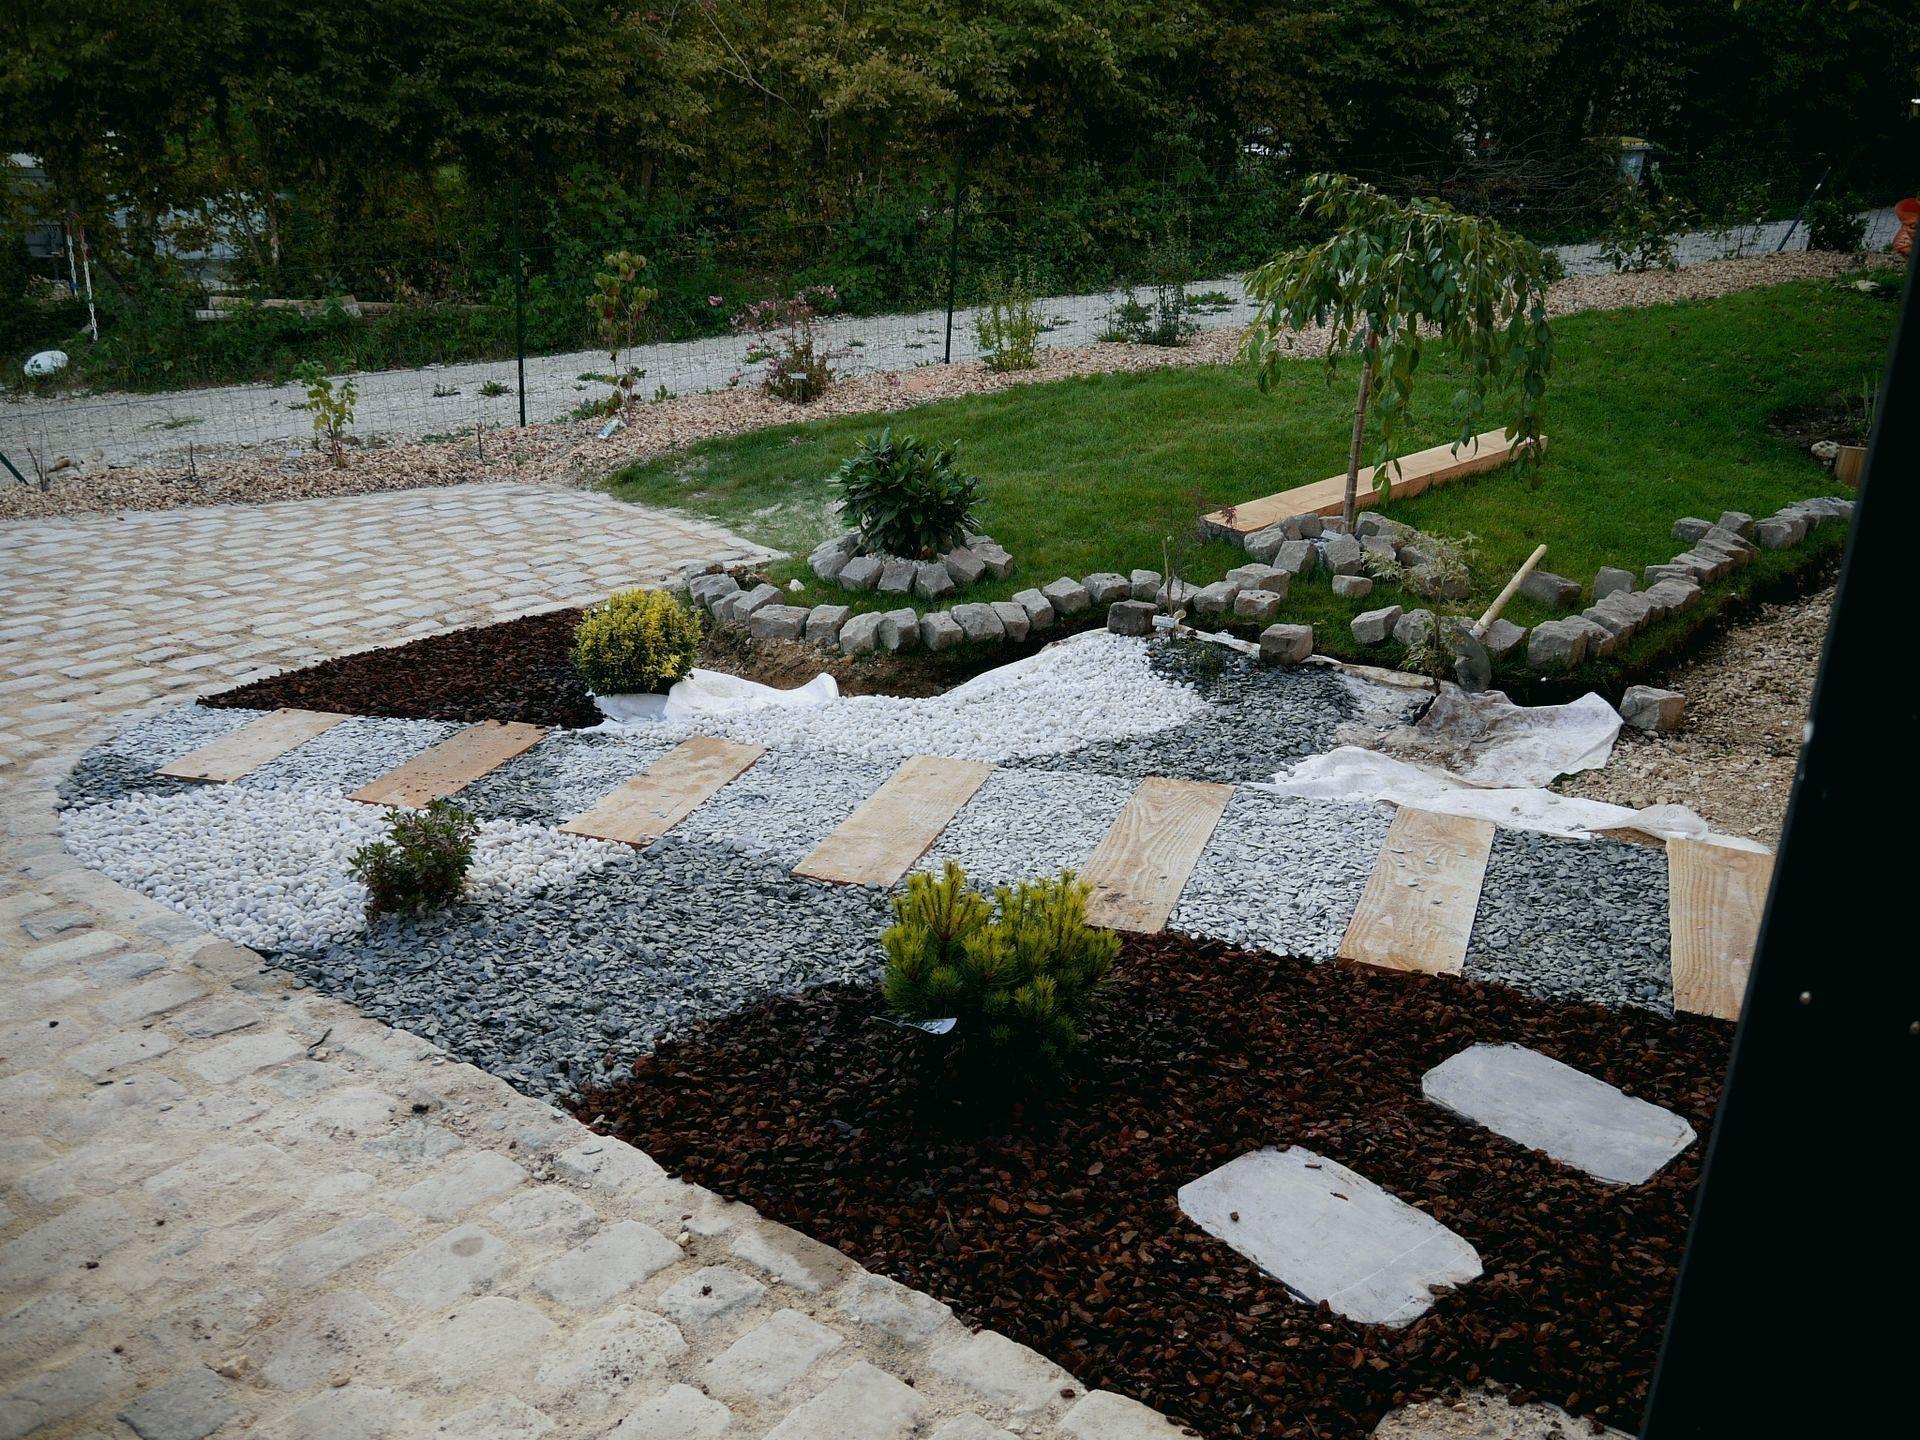 All E De Jardin Pas Cher Design De Maison Bordure Alle ... pour Bordure Jardin Pas Cher